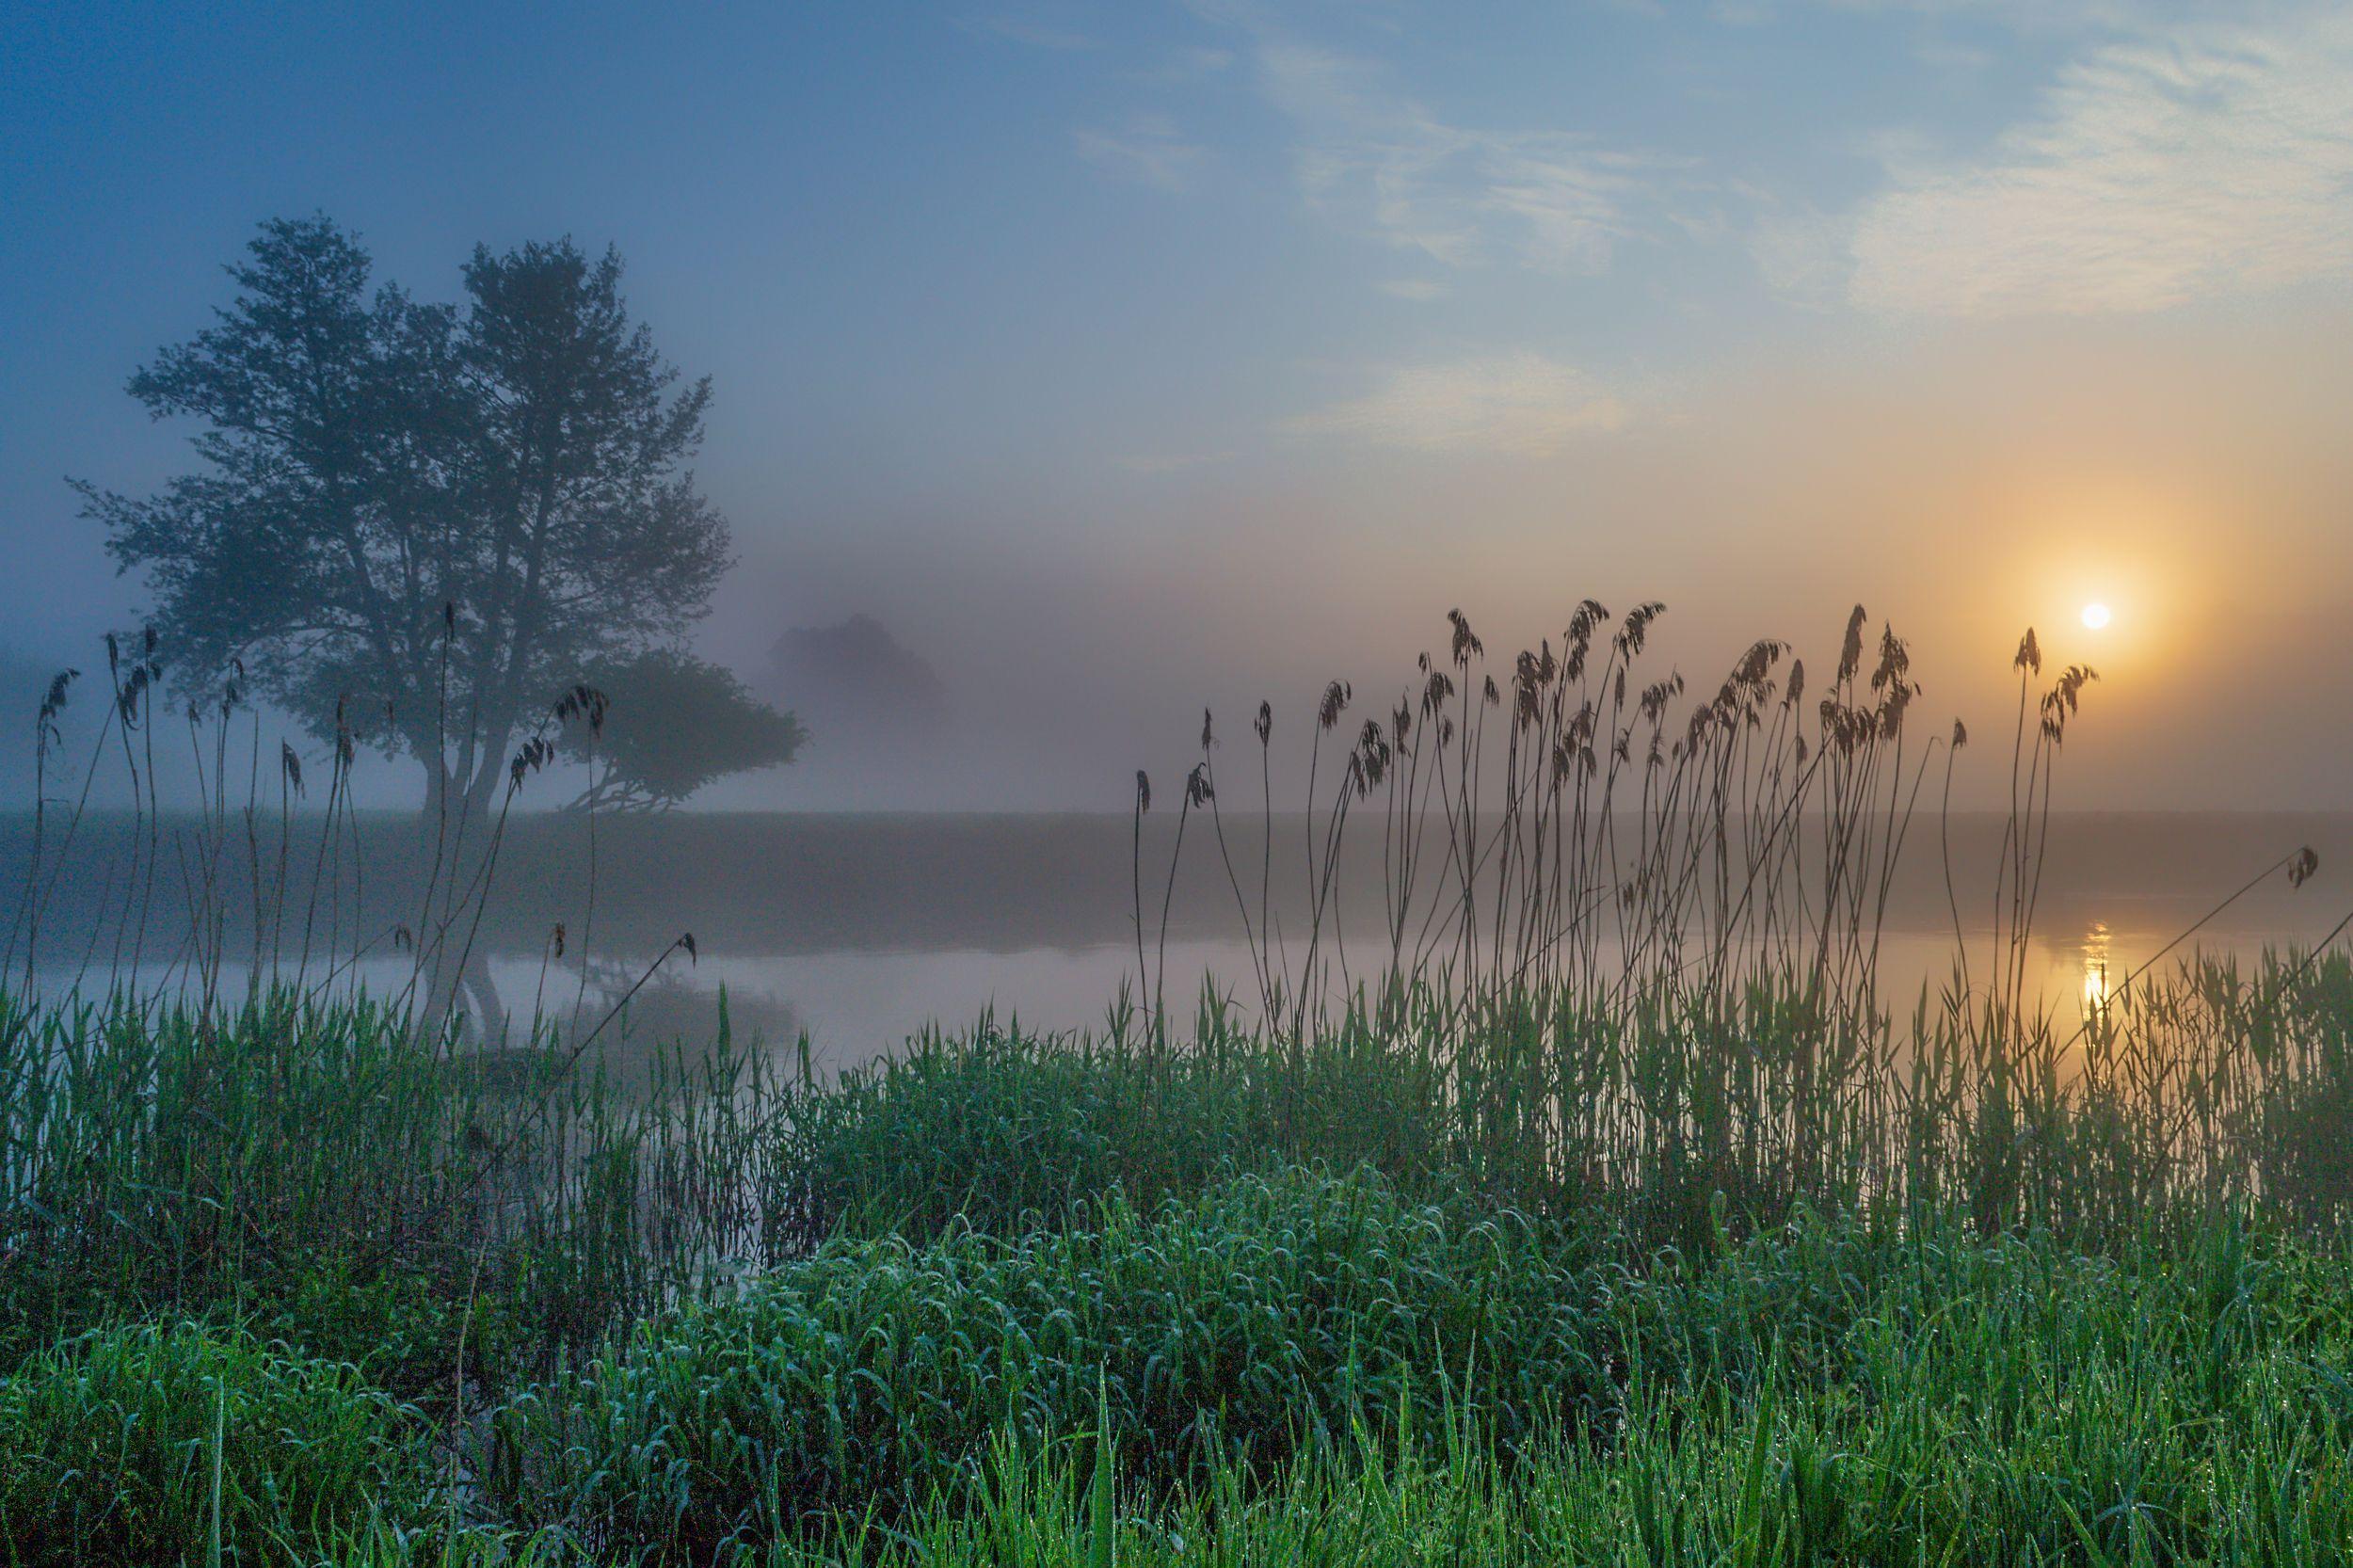 fog water tree light nature sky silence sun landscape atmosphere dawn river gwda nikon reflection, Tollas Krzysztof